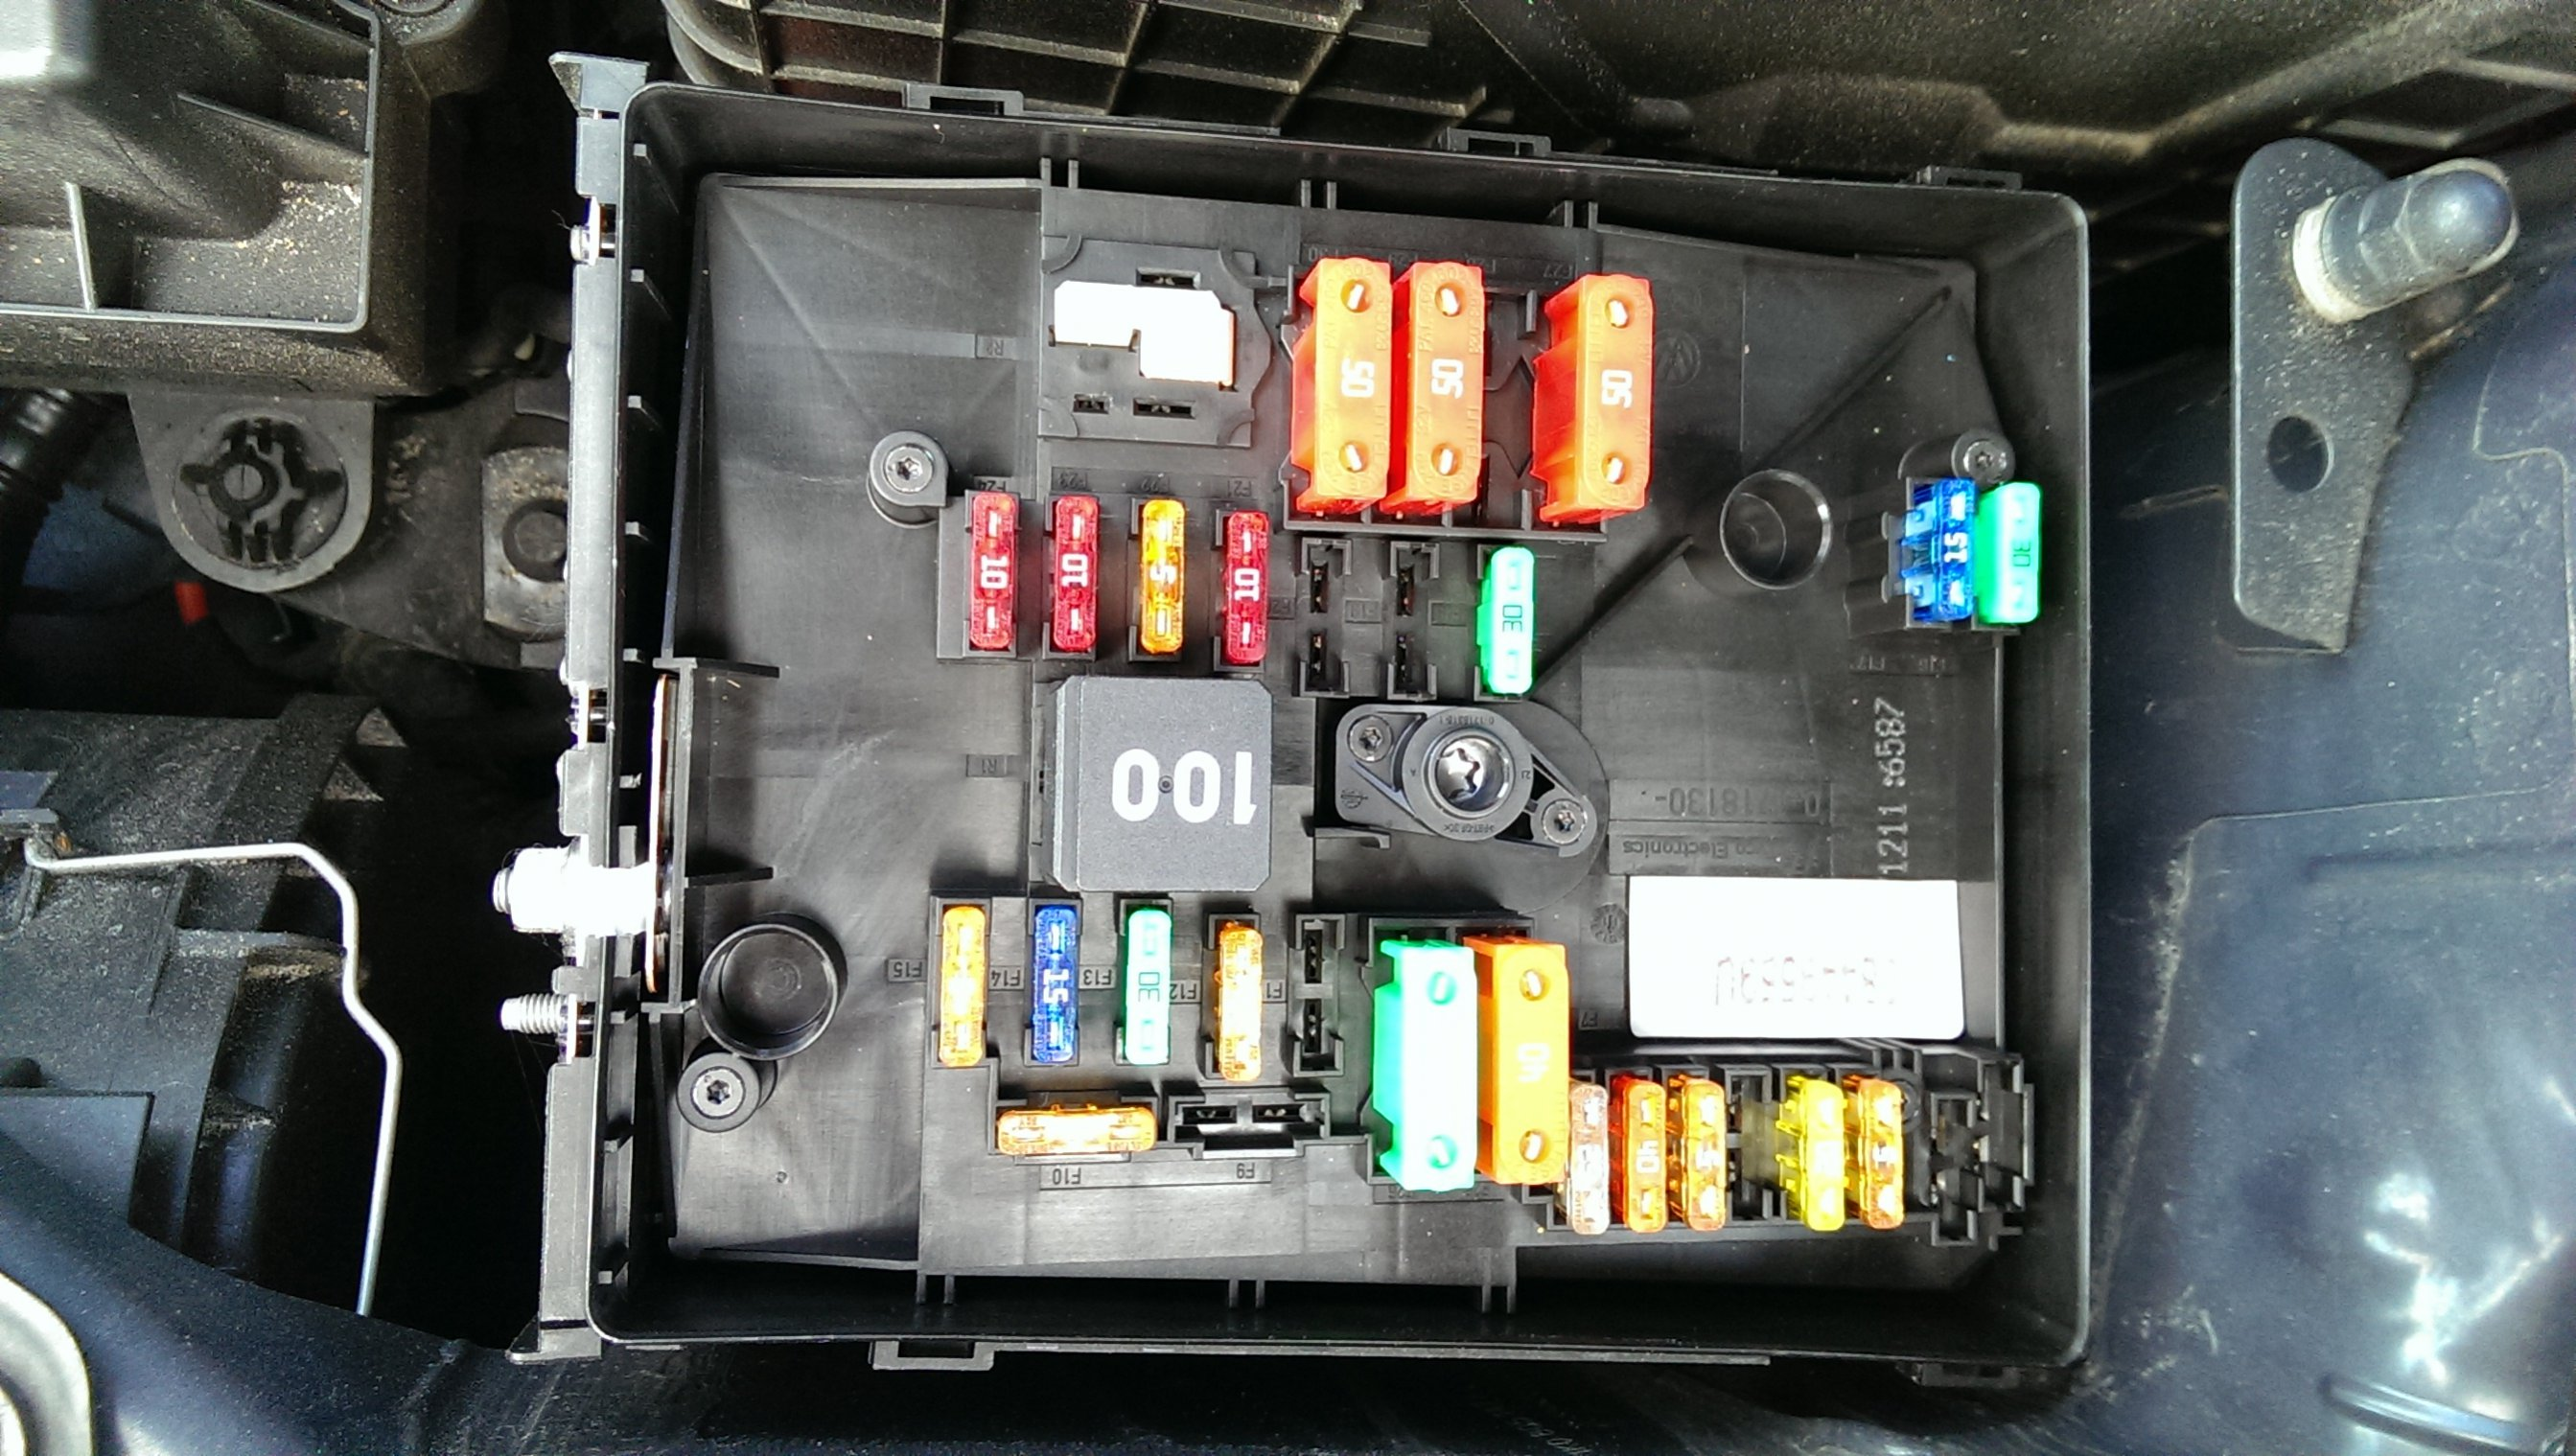 Vw Tiguan Fuse Box Manual Of Wiring Diagram Location 2012 Volkswagen Hyundai Genesis 2015 2010